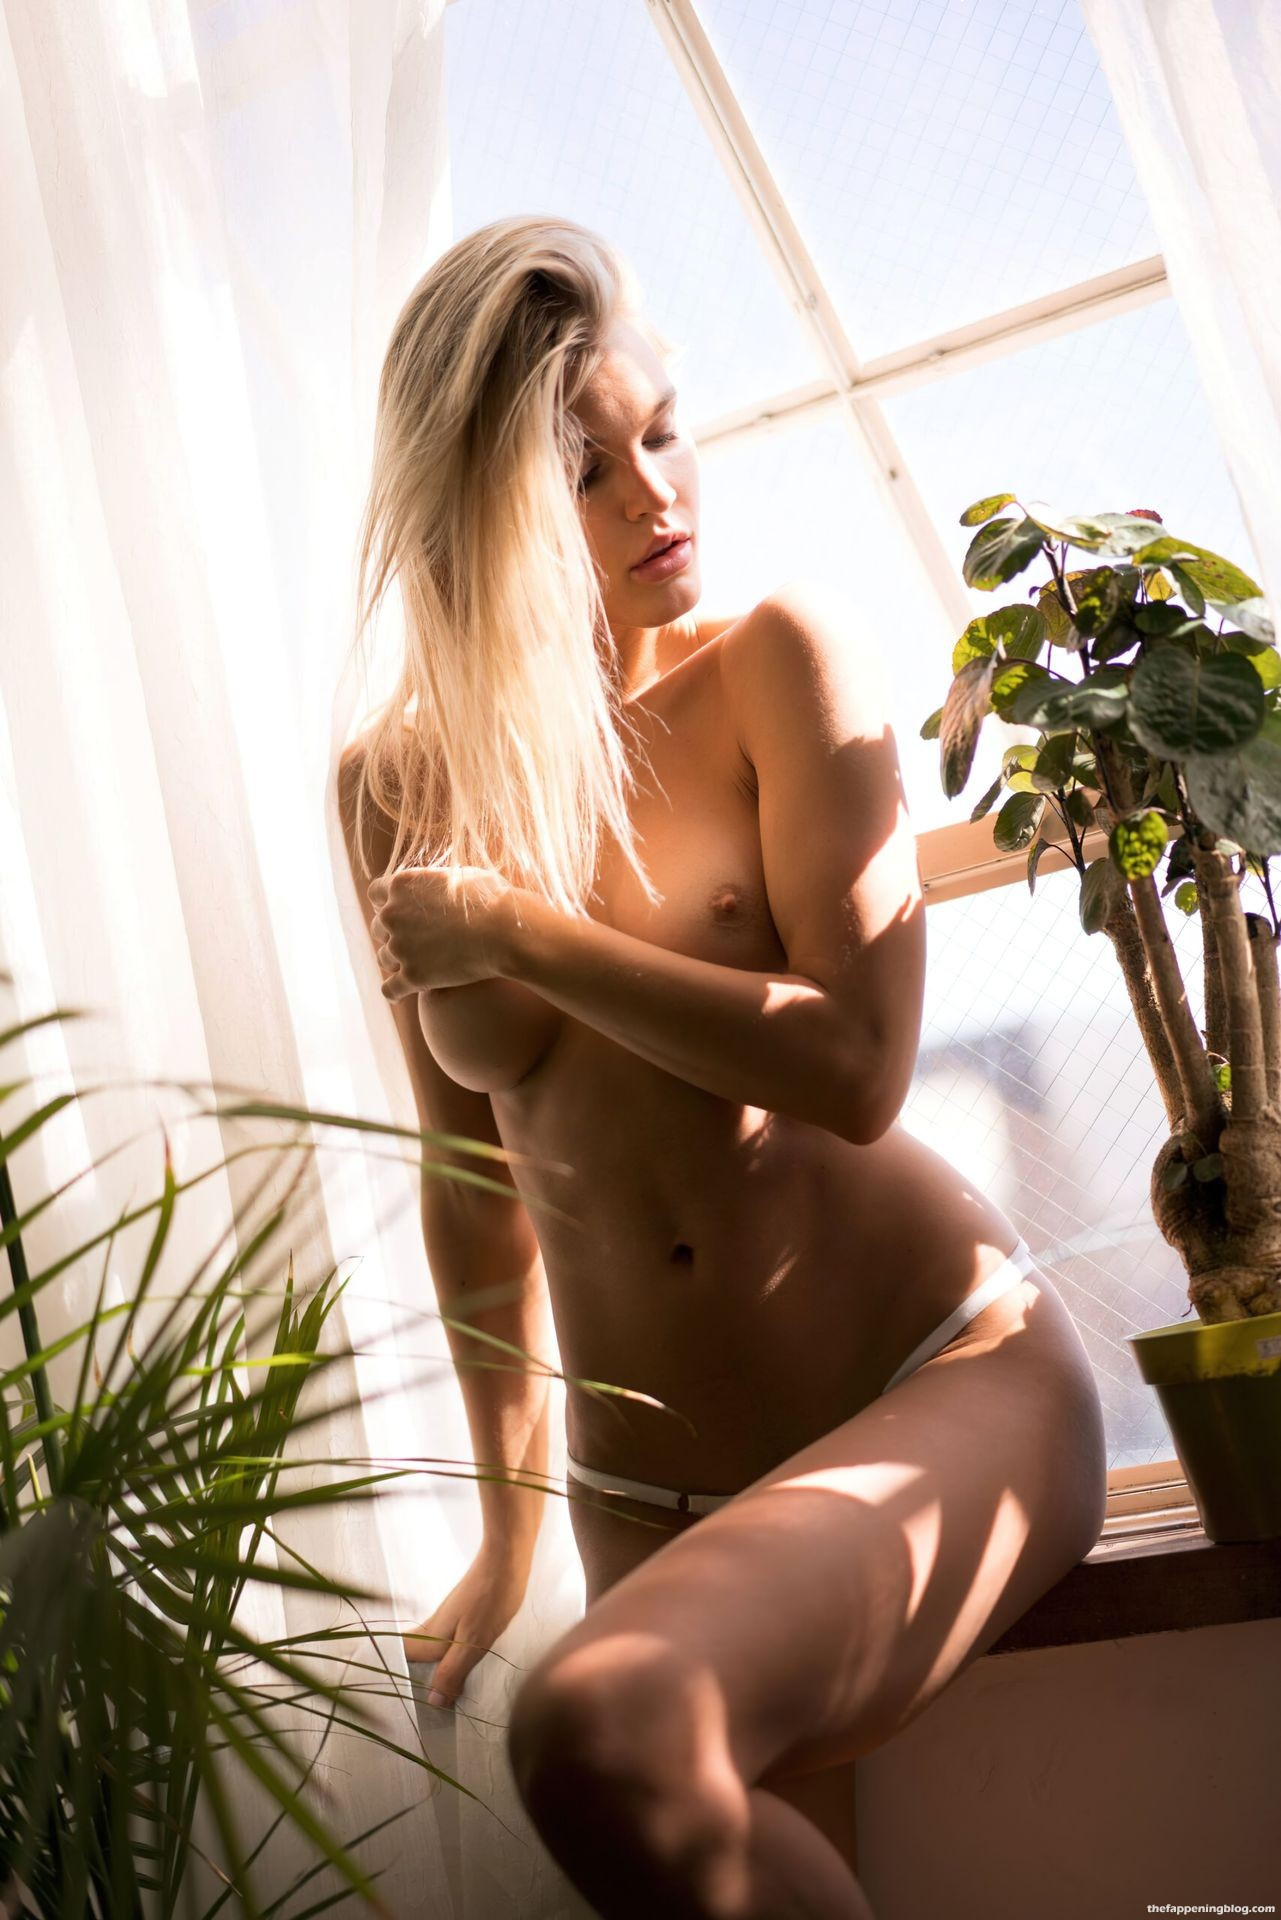 Joy-Corrigan-Naked-Tits-and-Ass-11-scaled1-thefappeningblog.com_.jpg